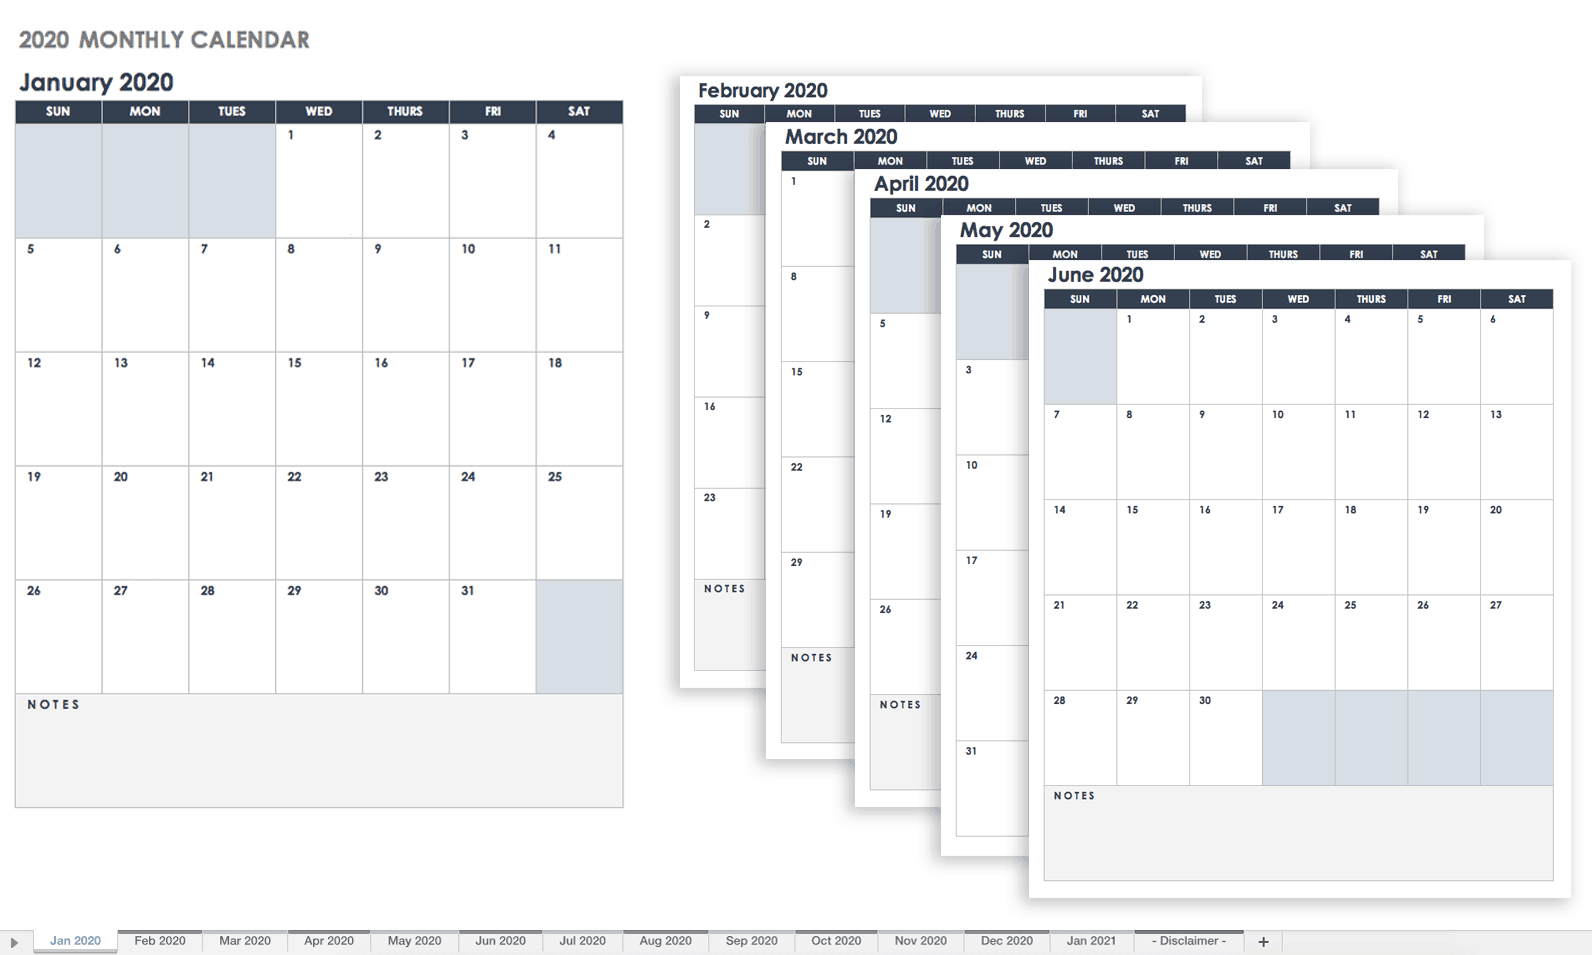 Google Calendar Template 2020 - Wpa.wpart.co